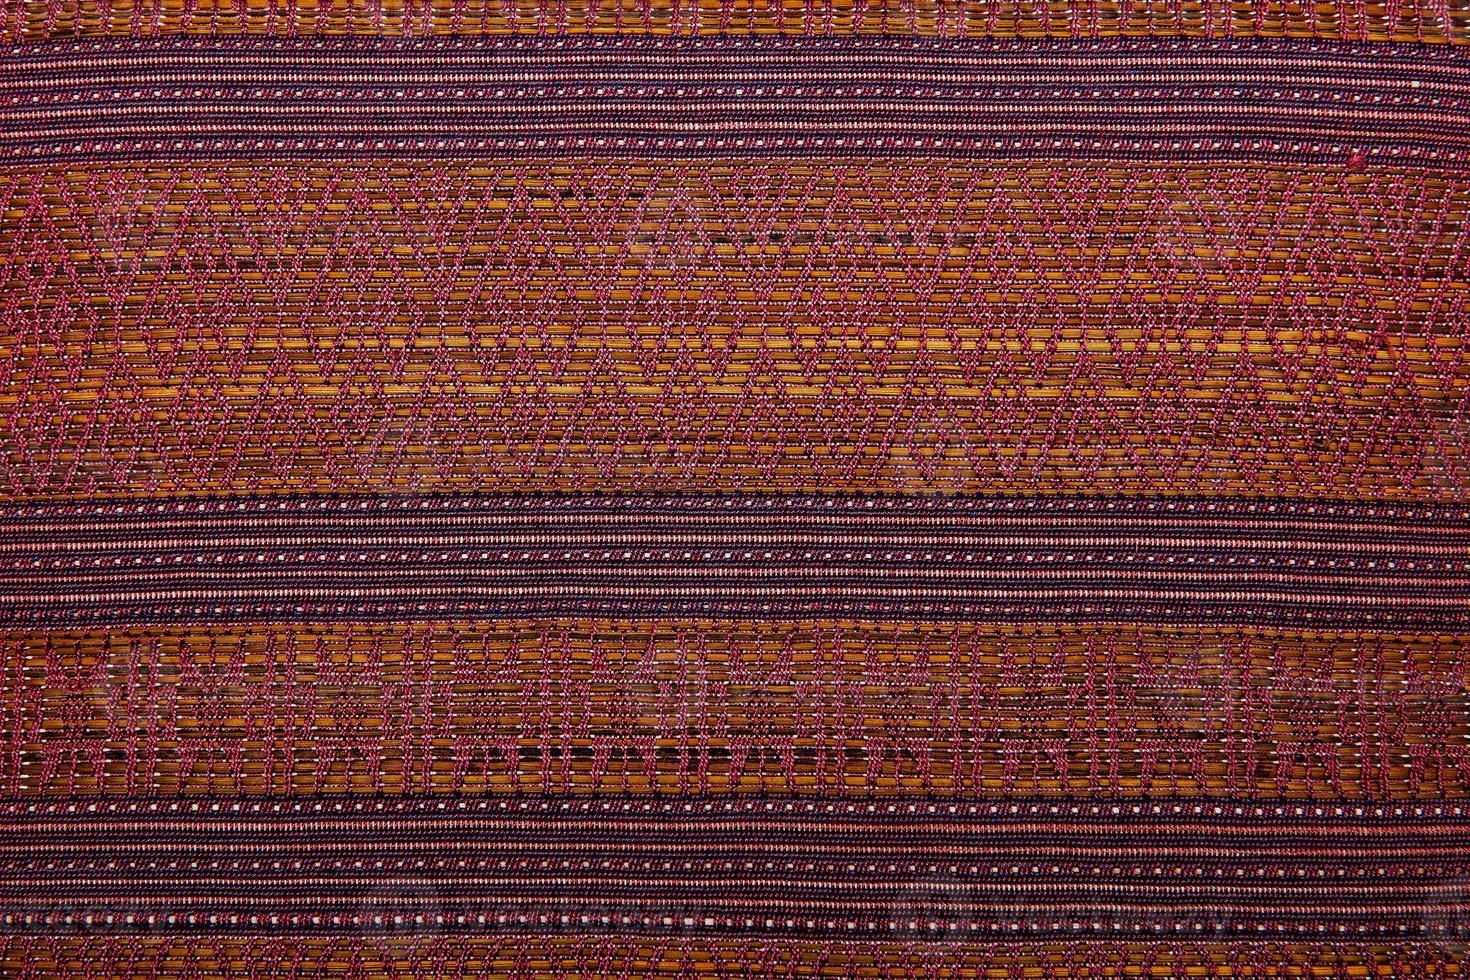 bunte afrikanische peruanische Art Teppichoberfläche nah oben foto